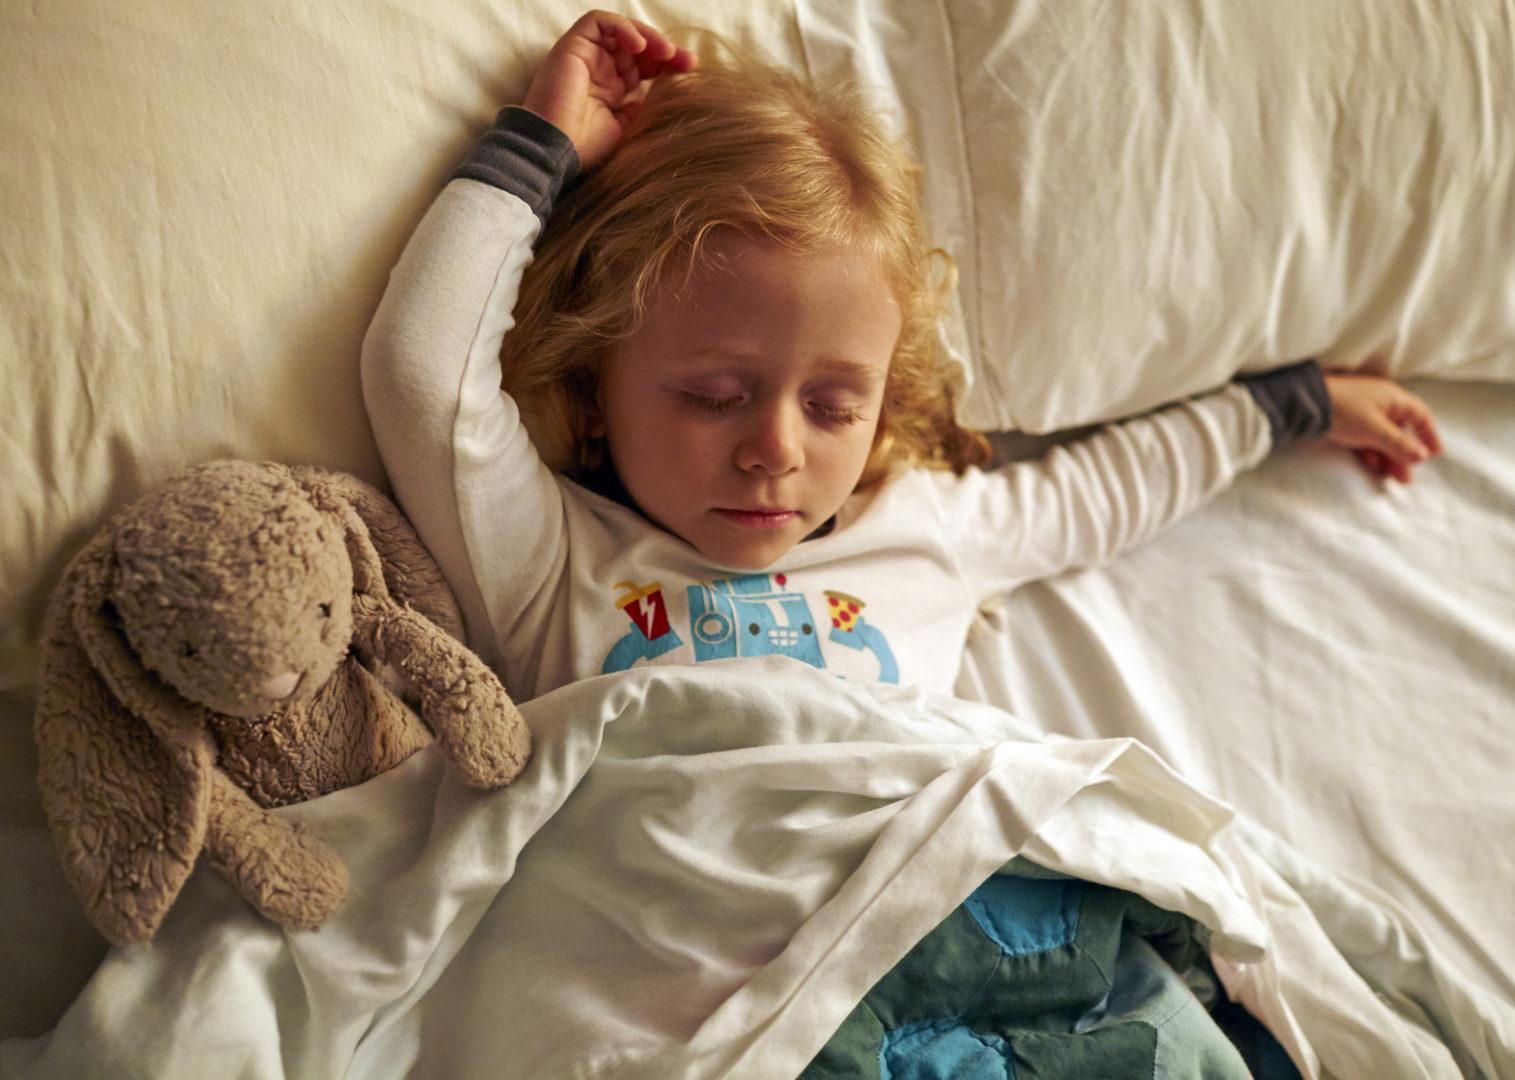 6 potential toddler pillow hazards, plus 6 safer kids' pillow picks